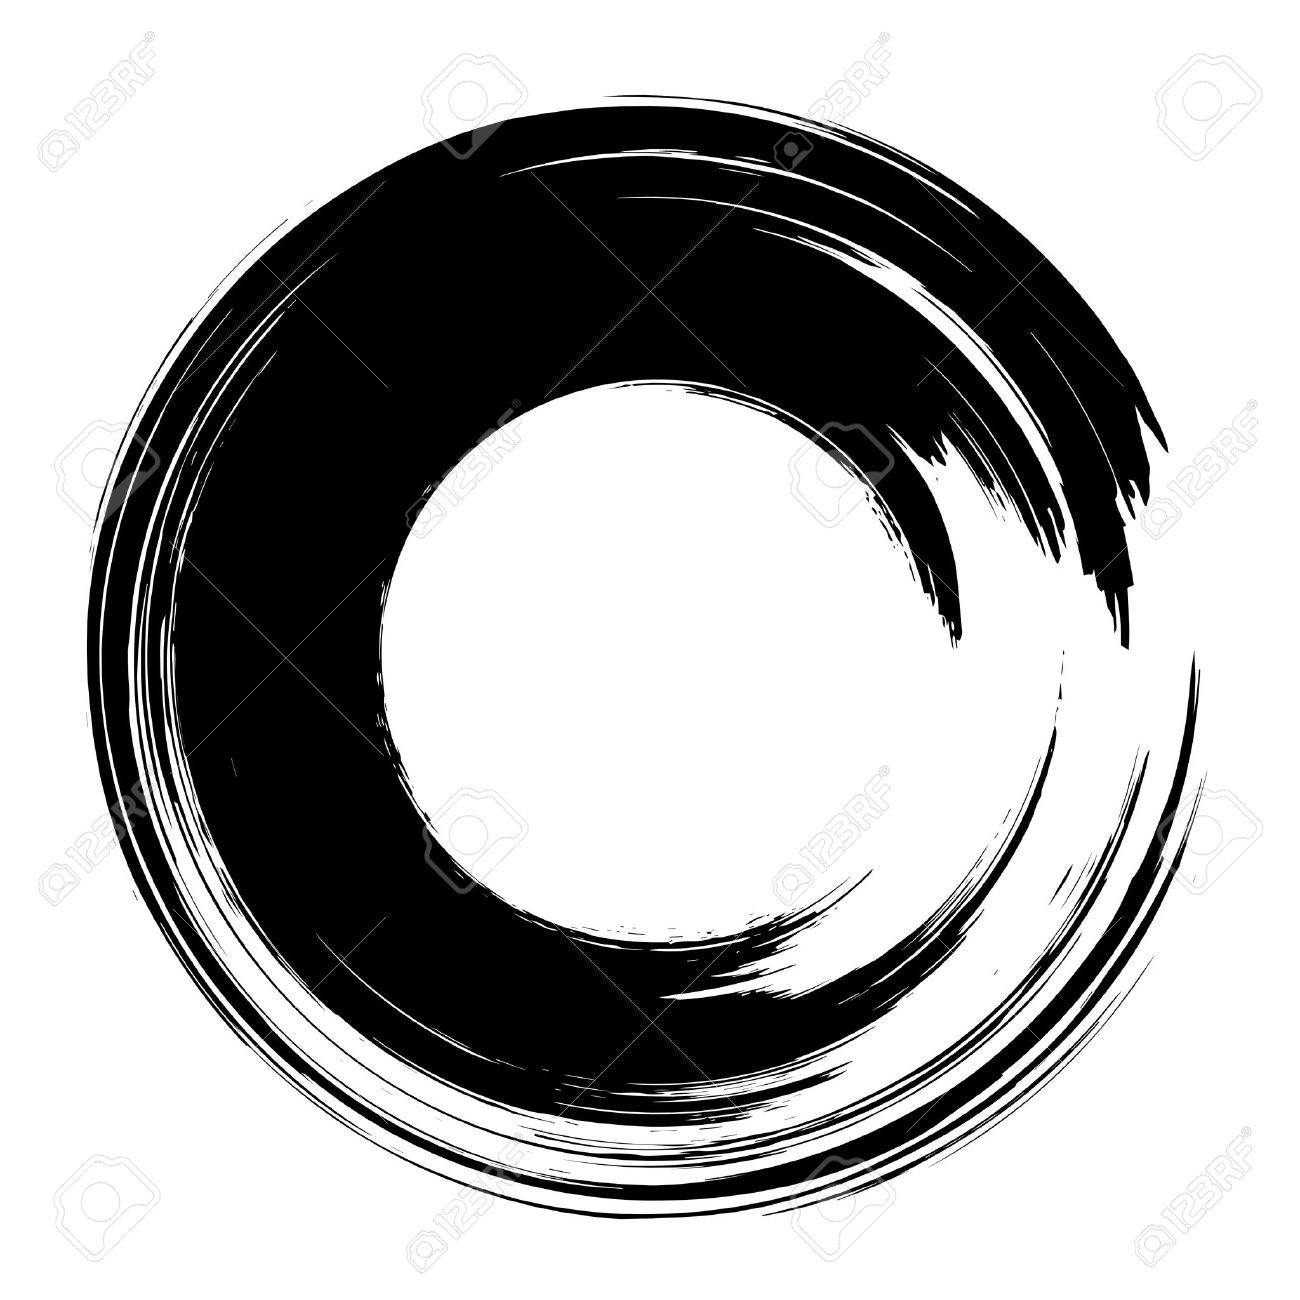 grunge hand drawn black paintbrush circle curved brush stroke rh 123rf com brush stroke vector free brush stroke vector free